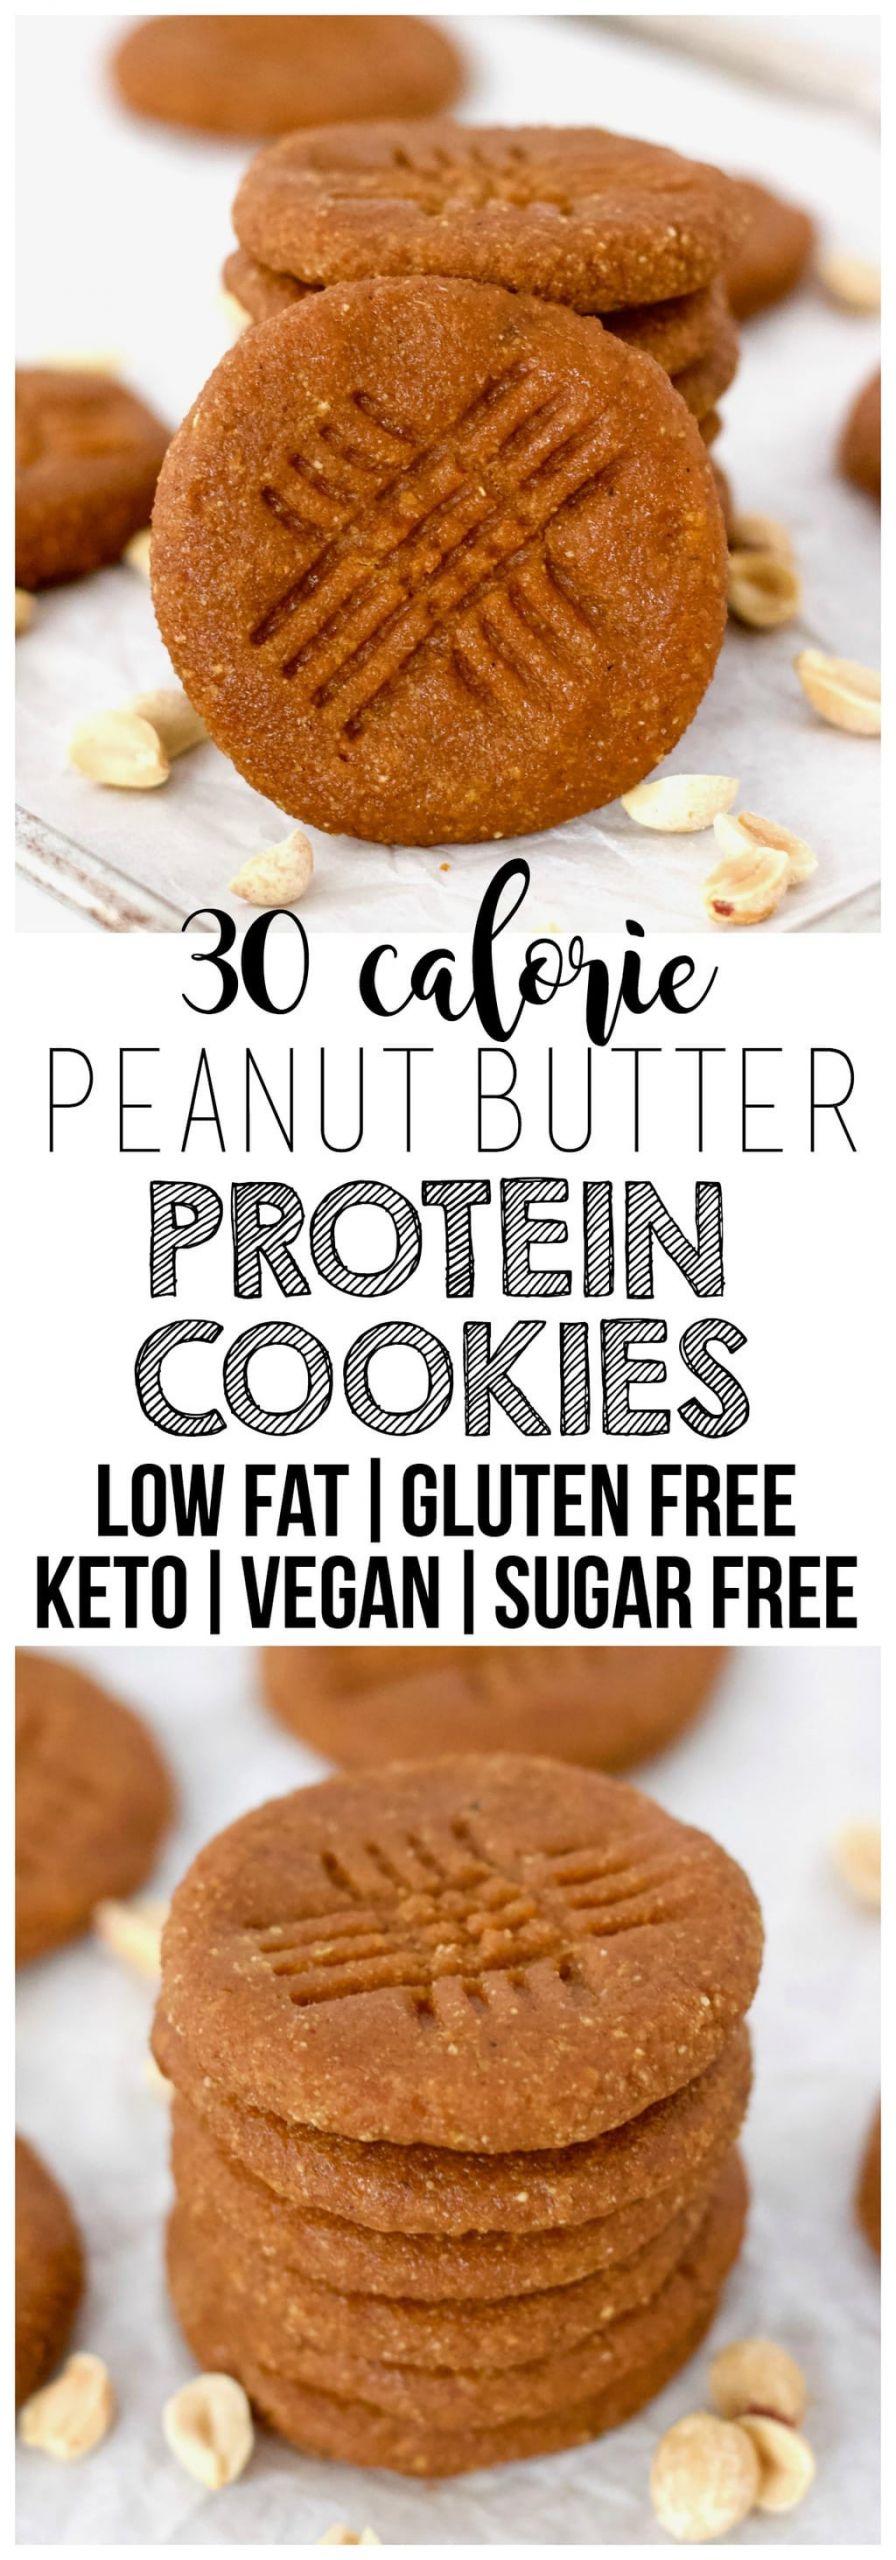 Vegan Protein Cookies  Keto Vegan Peanut Butter Protein Cookies Gluten Free